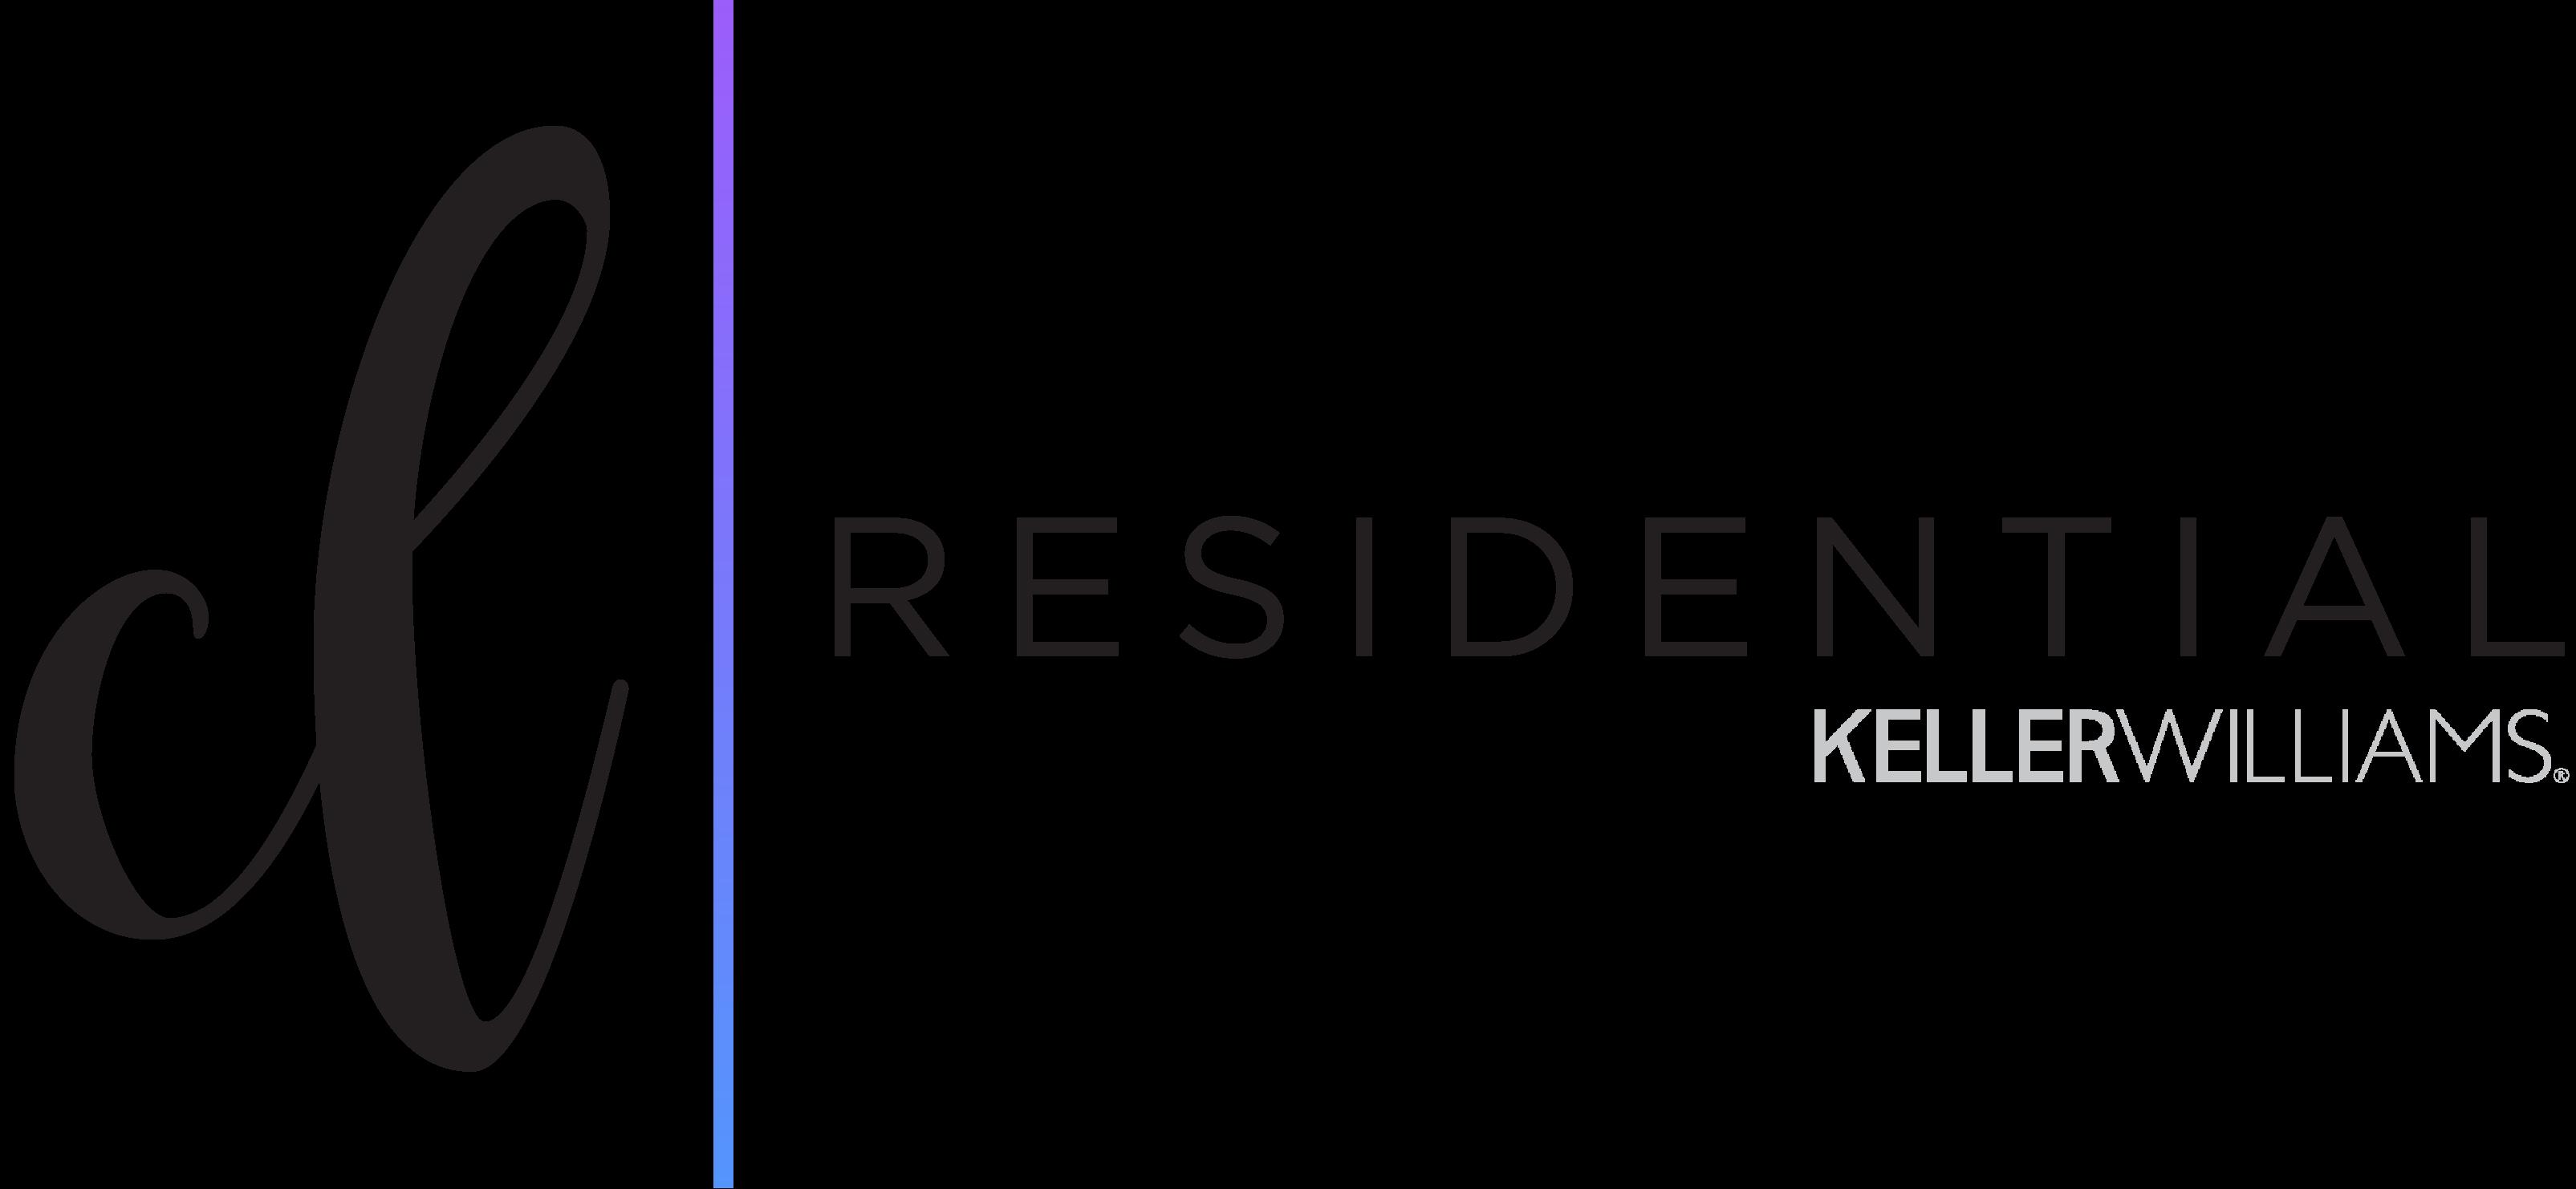 CL Residential at Keller Williams Realty logo